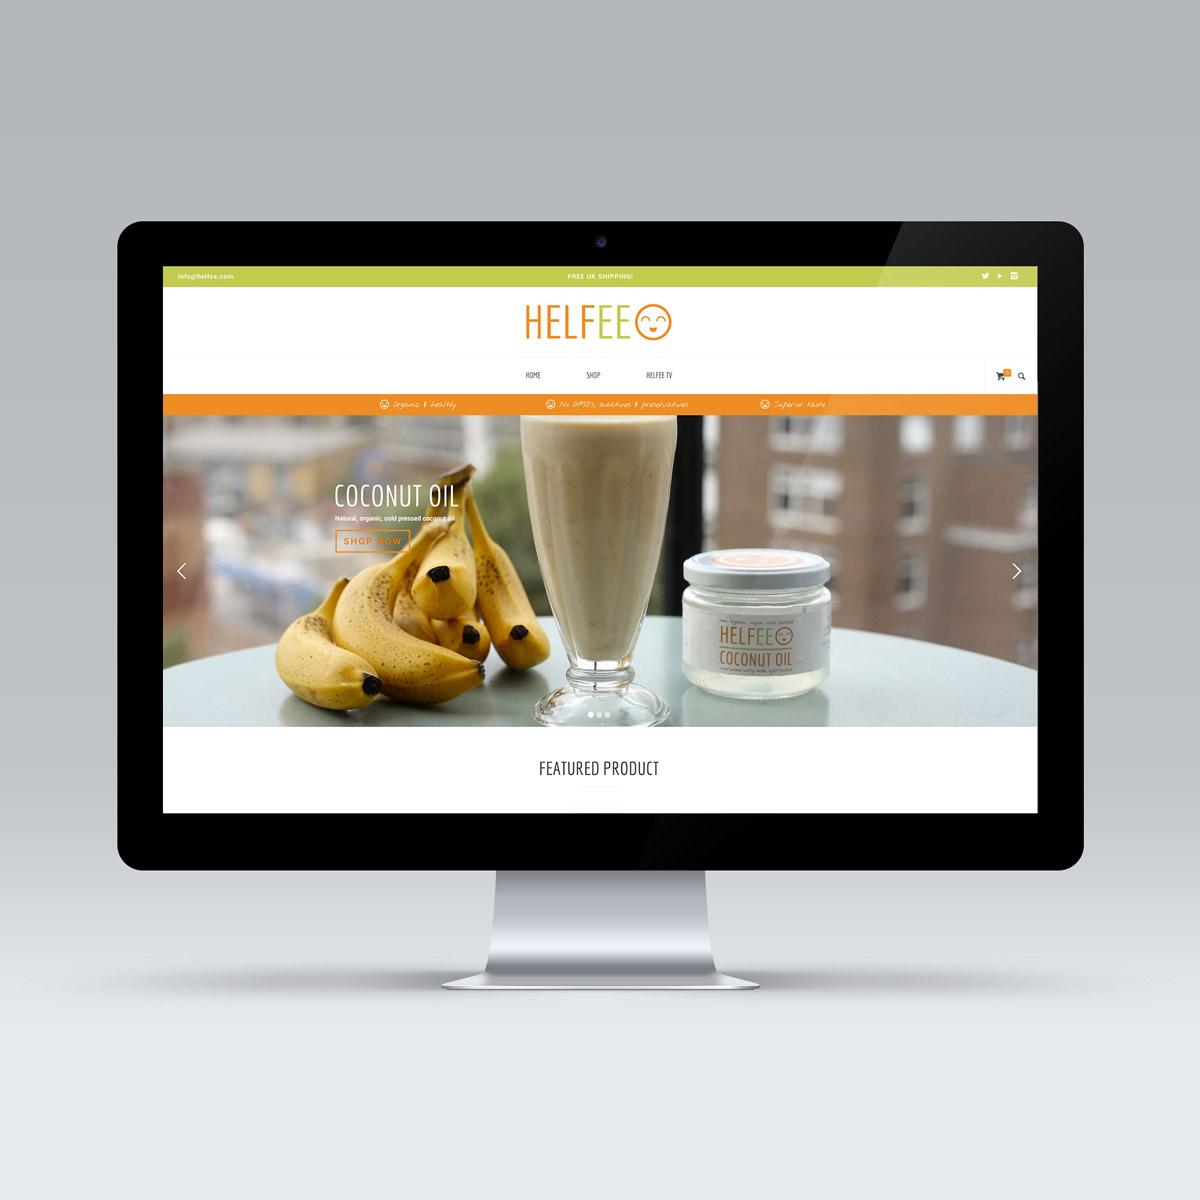 Promoworx - Helfee Website